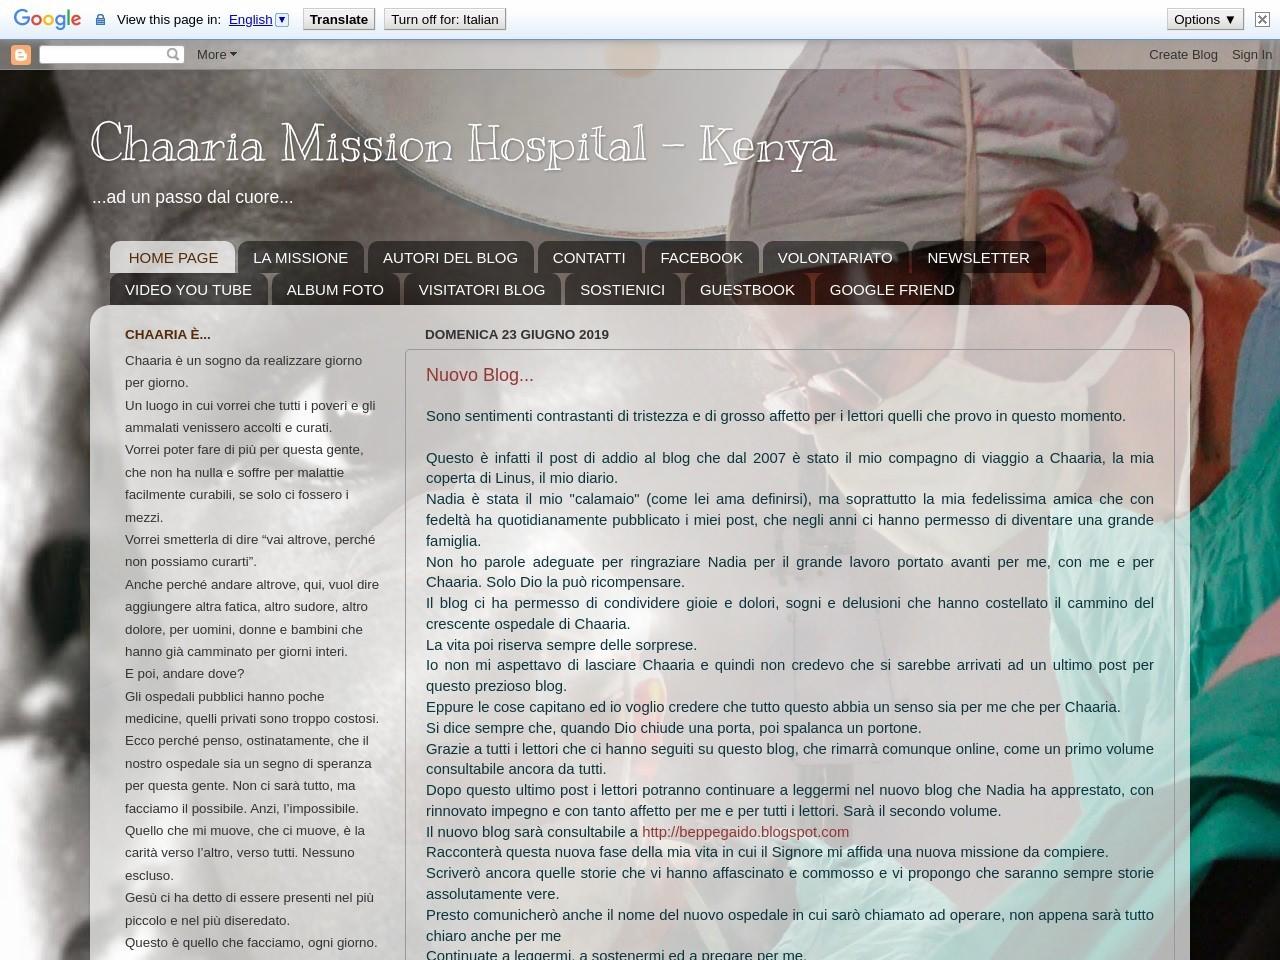 chaaria-mission-hospital